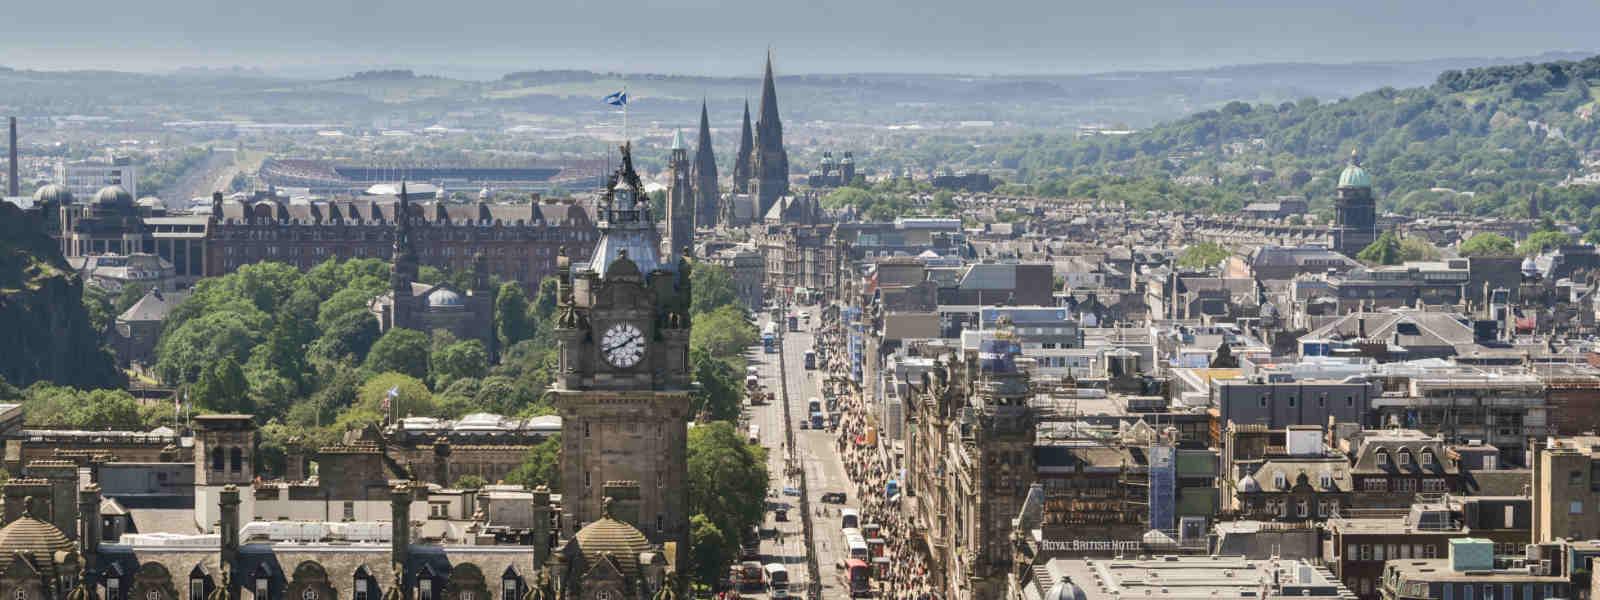 Panoramic view of Princes Street in Edinburgh